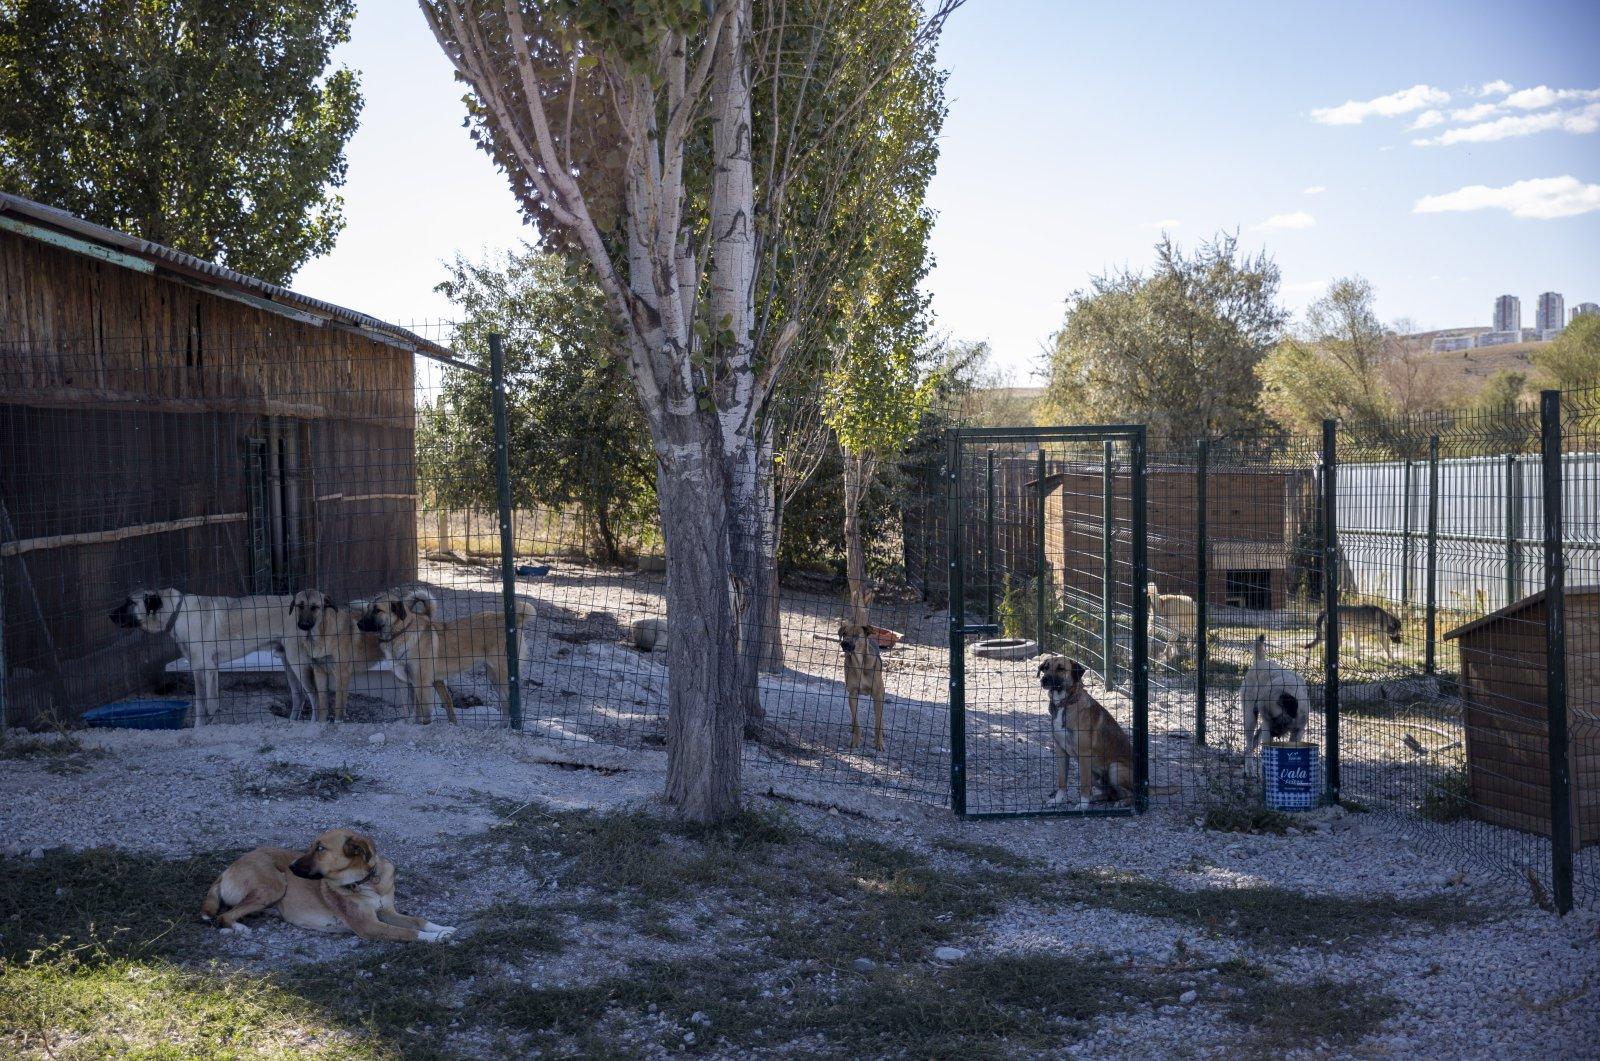 Animals are seen at the shelter built by Patiko in Etimesgut, Ankara, Turkey,  Oct. 3, 2021. (AA Photo)